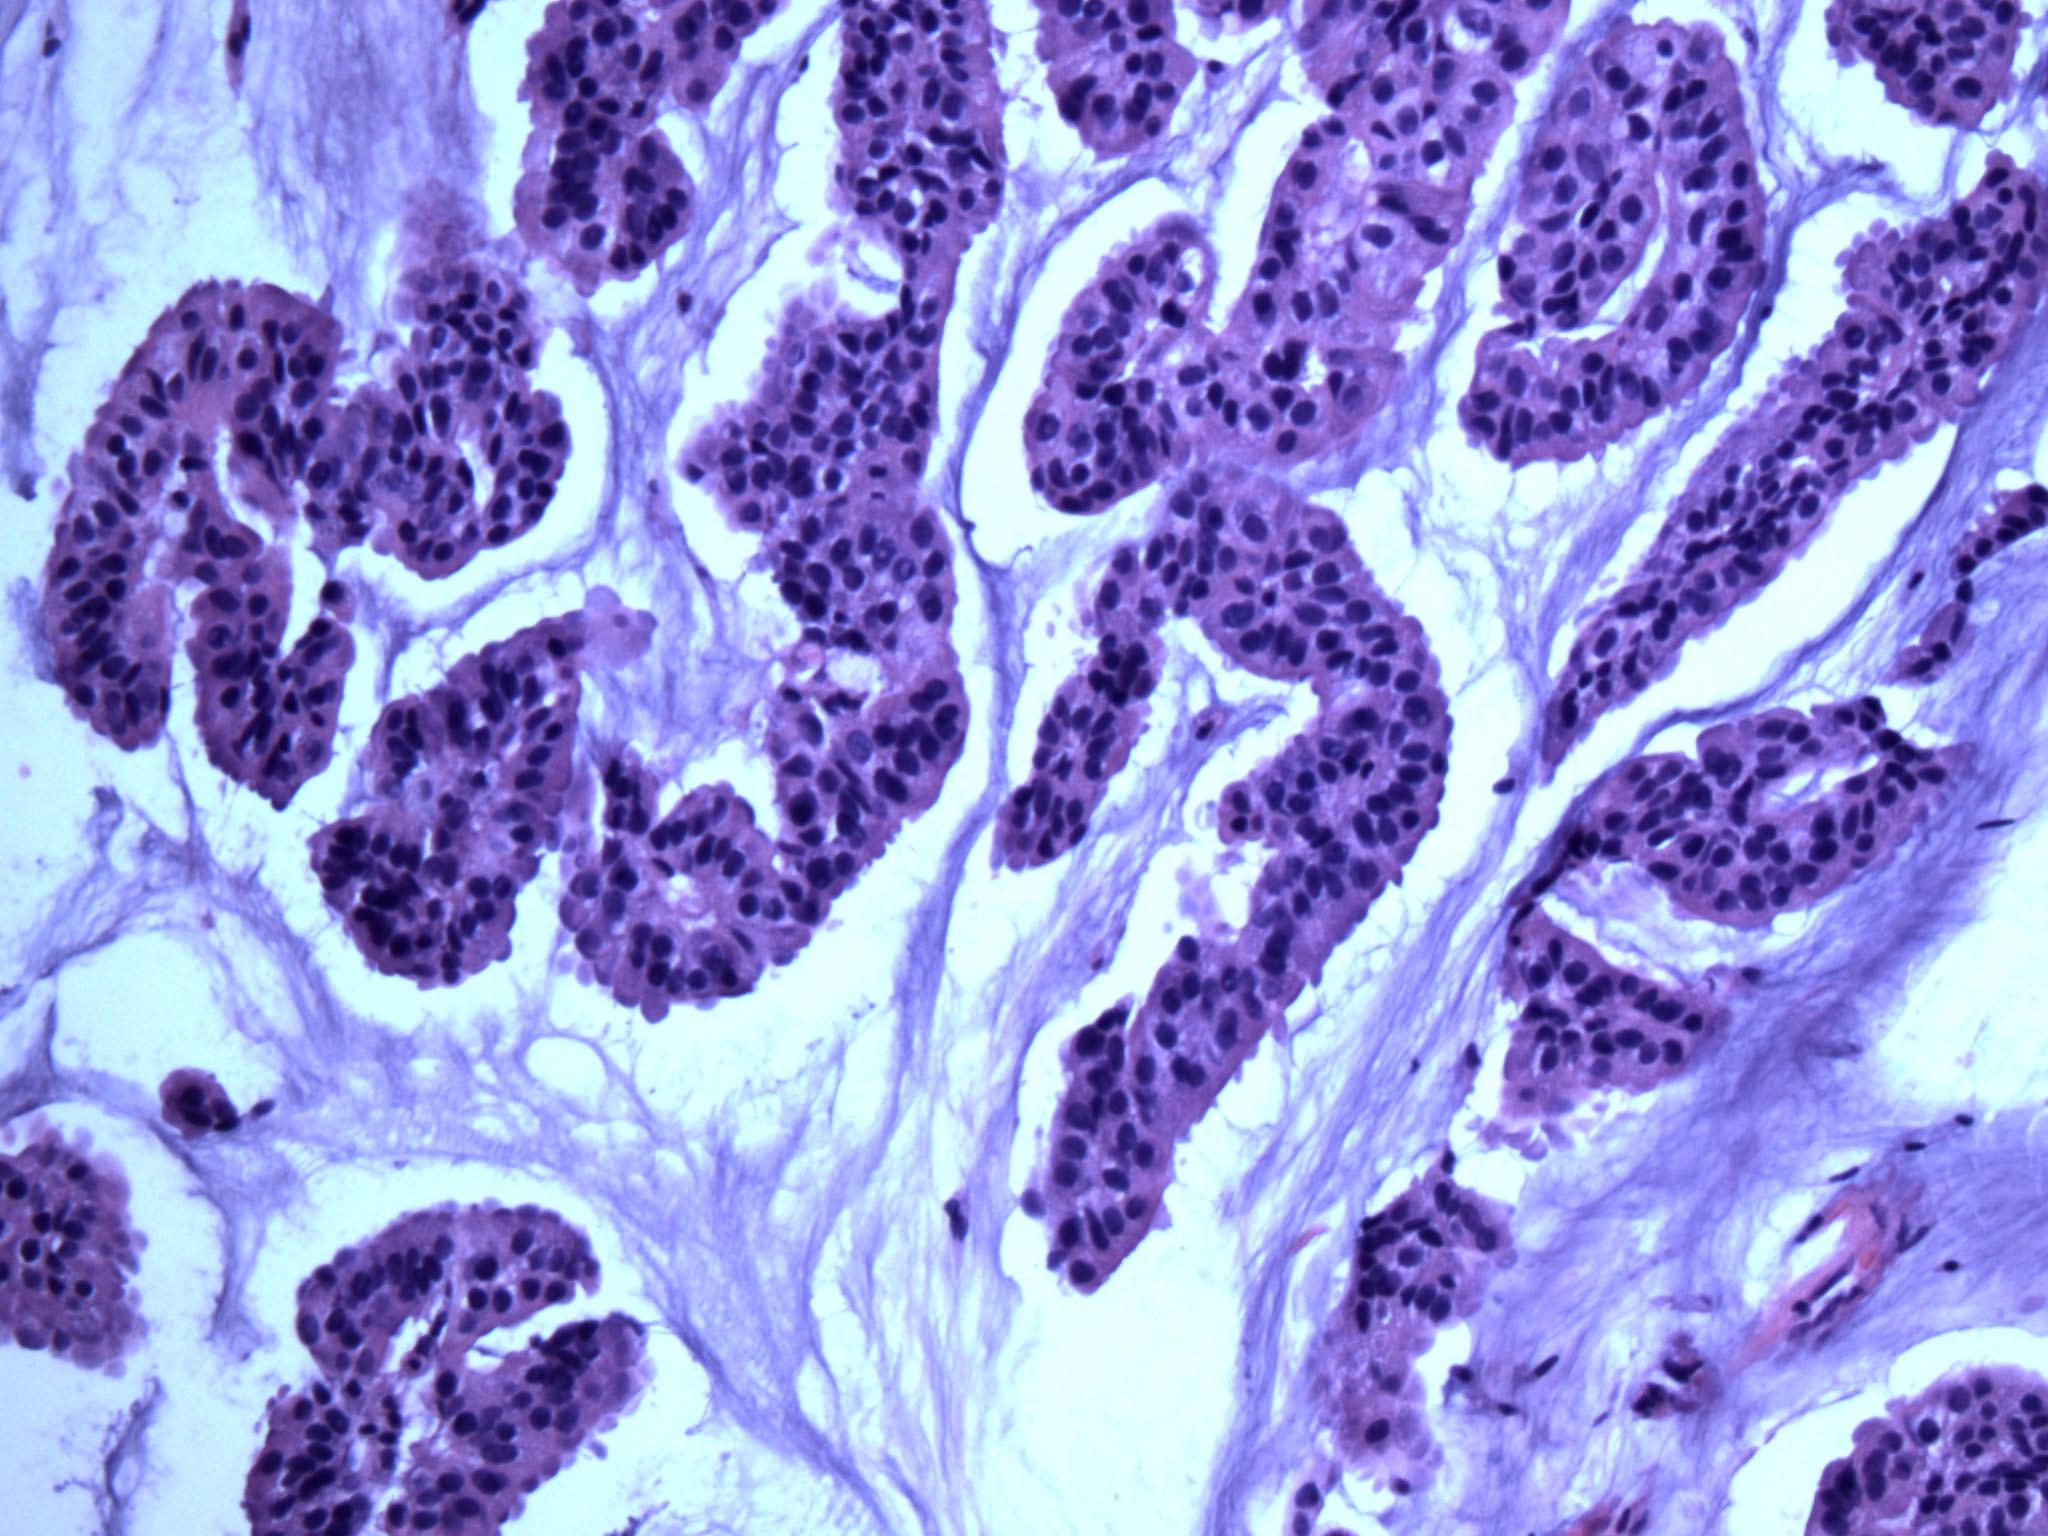 Mucinous hypercellular tumor